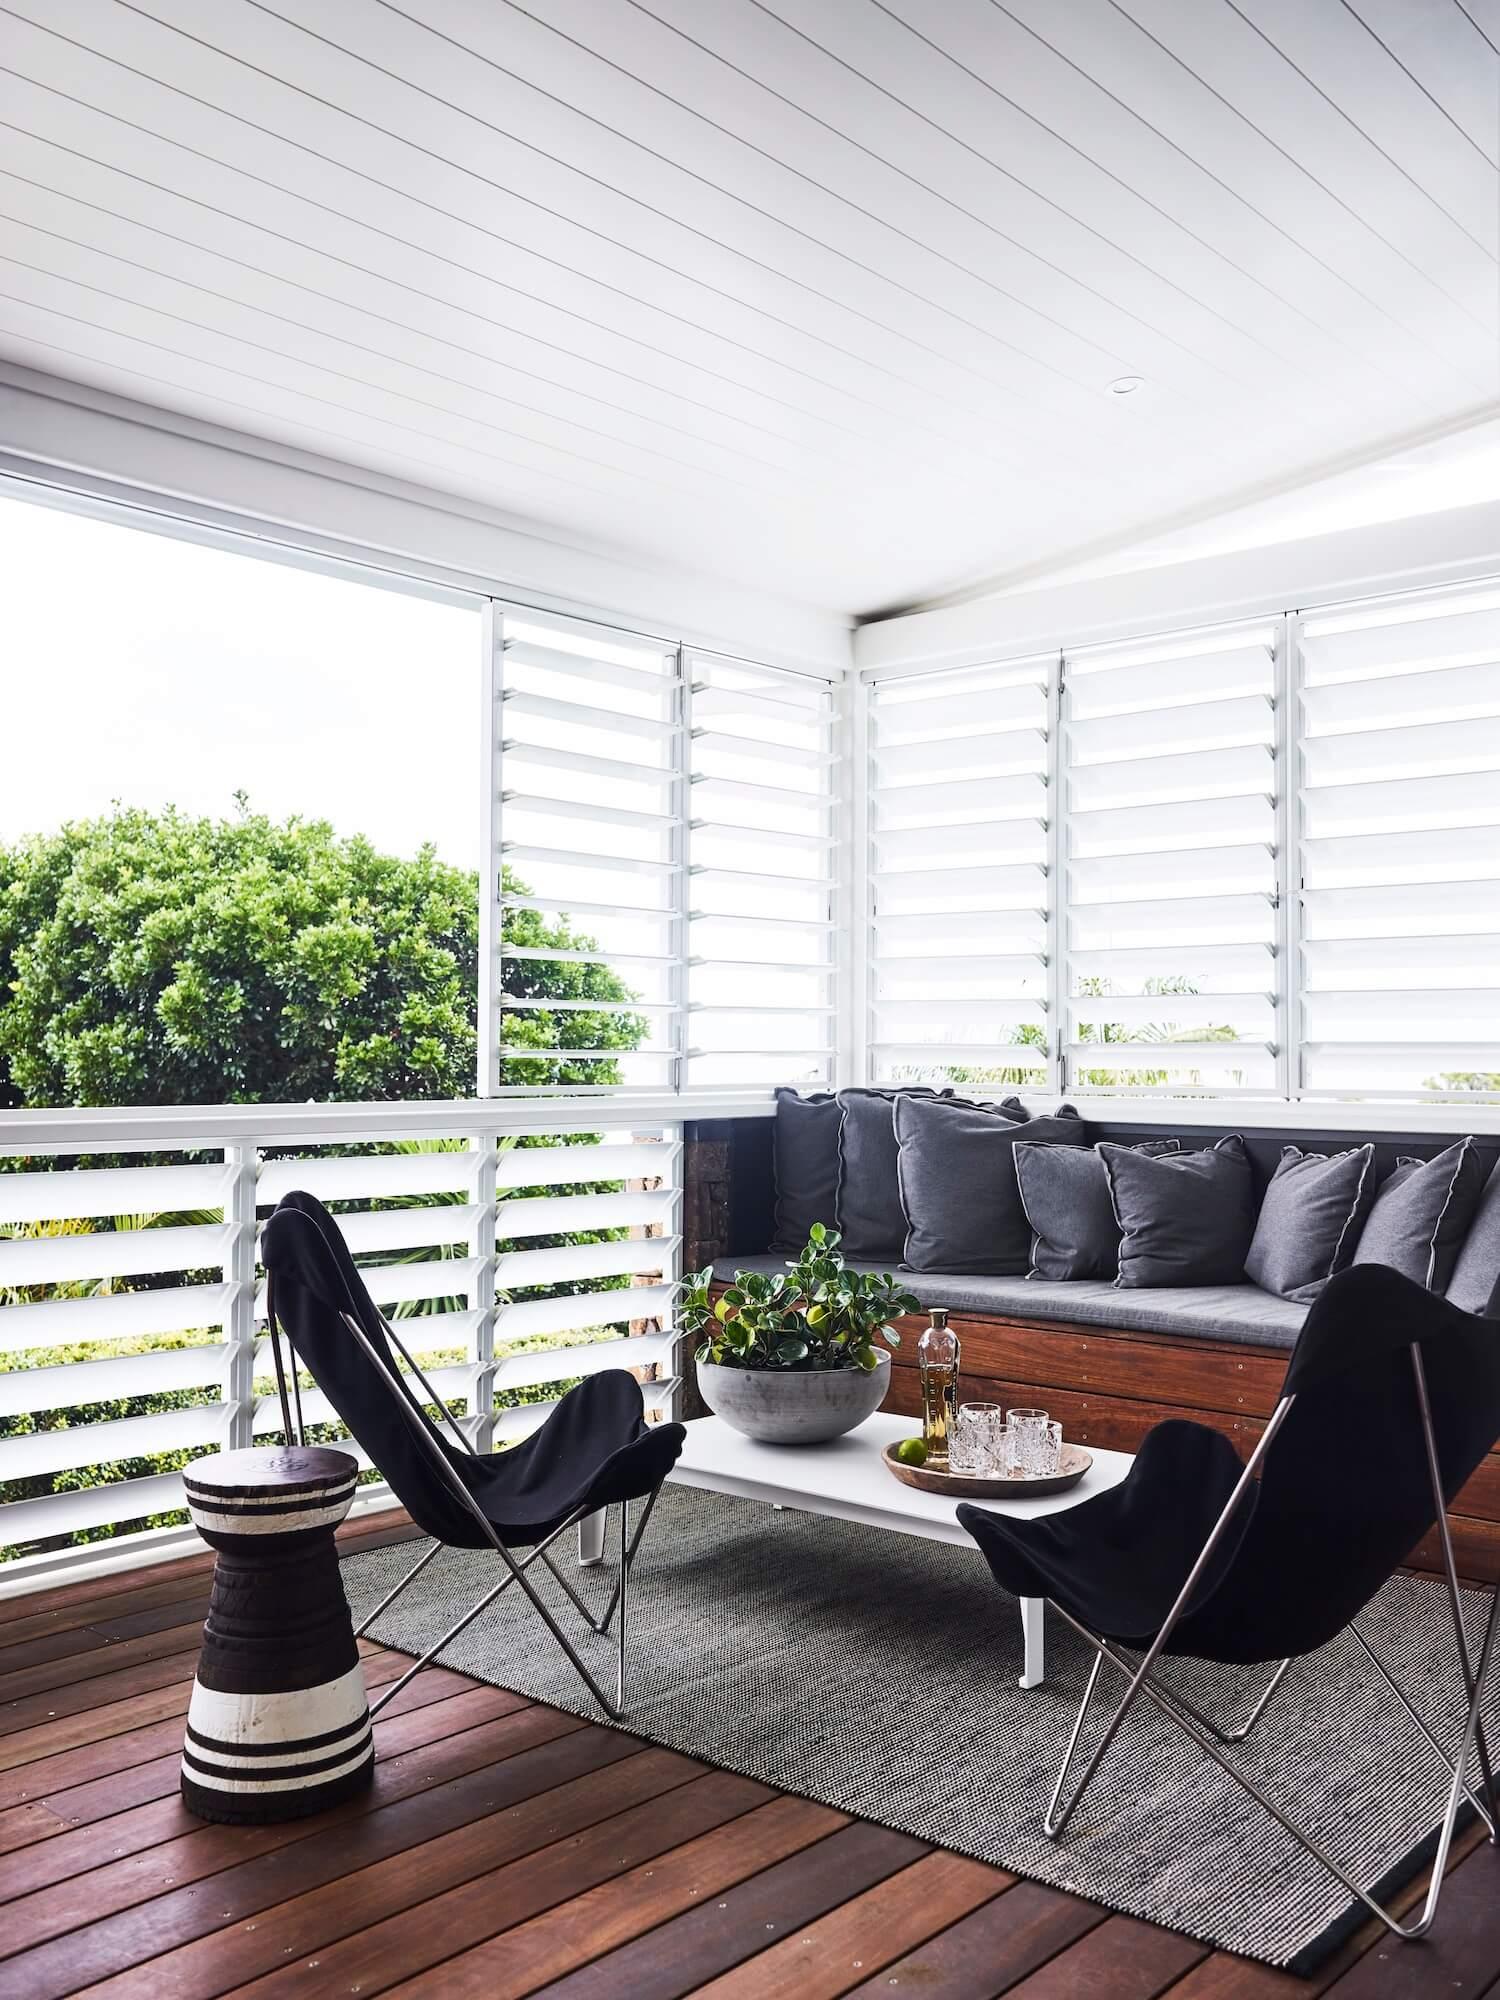 est living interiors ayindi corben architects 11